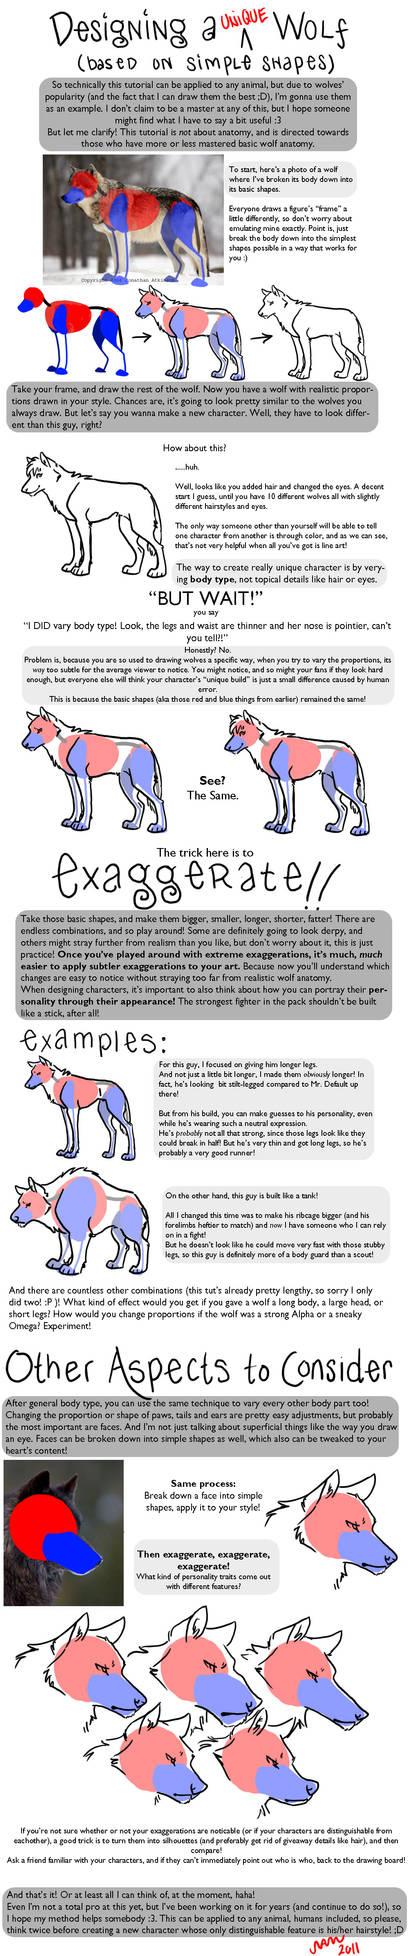 Designing a Unique Wolf